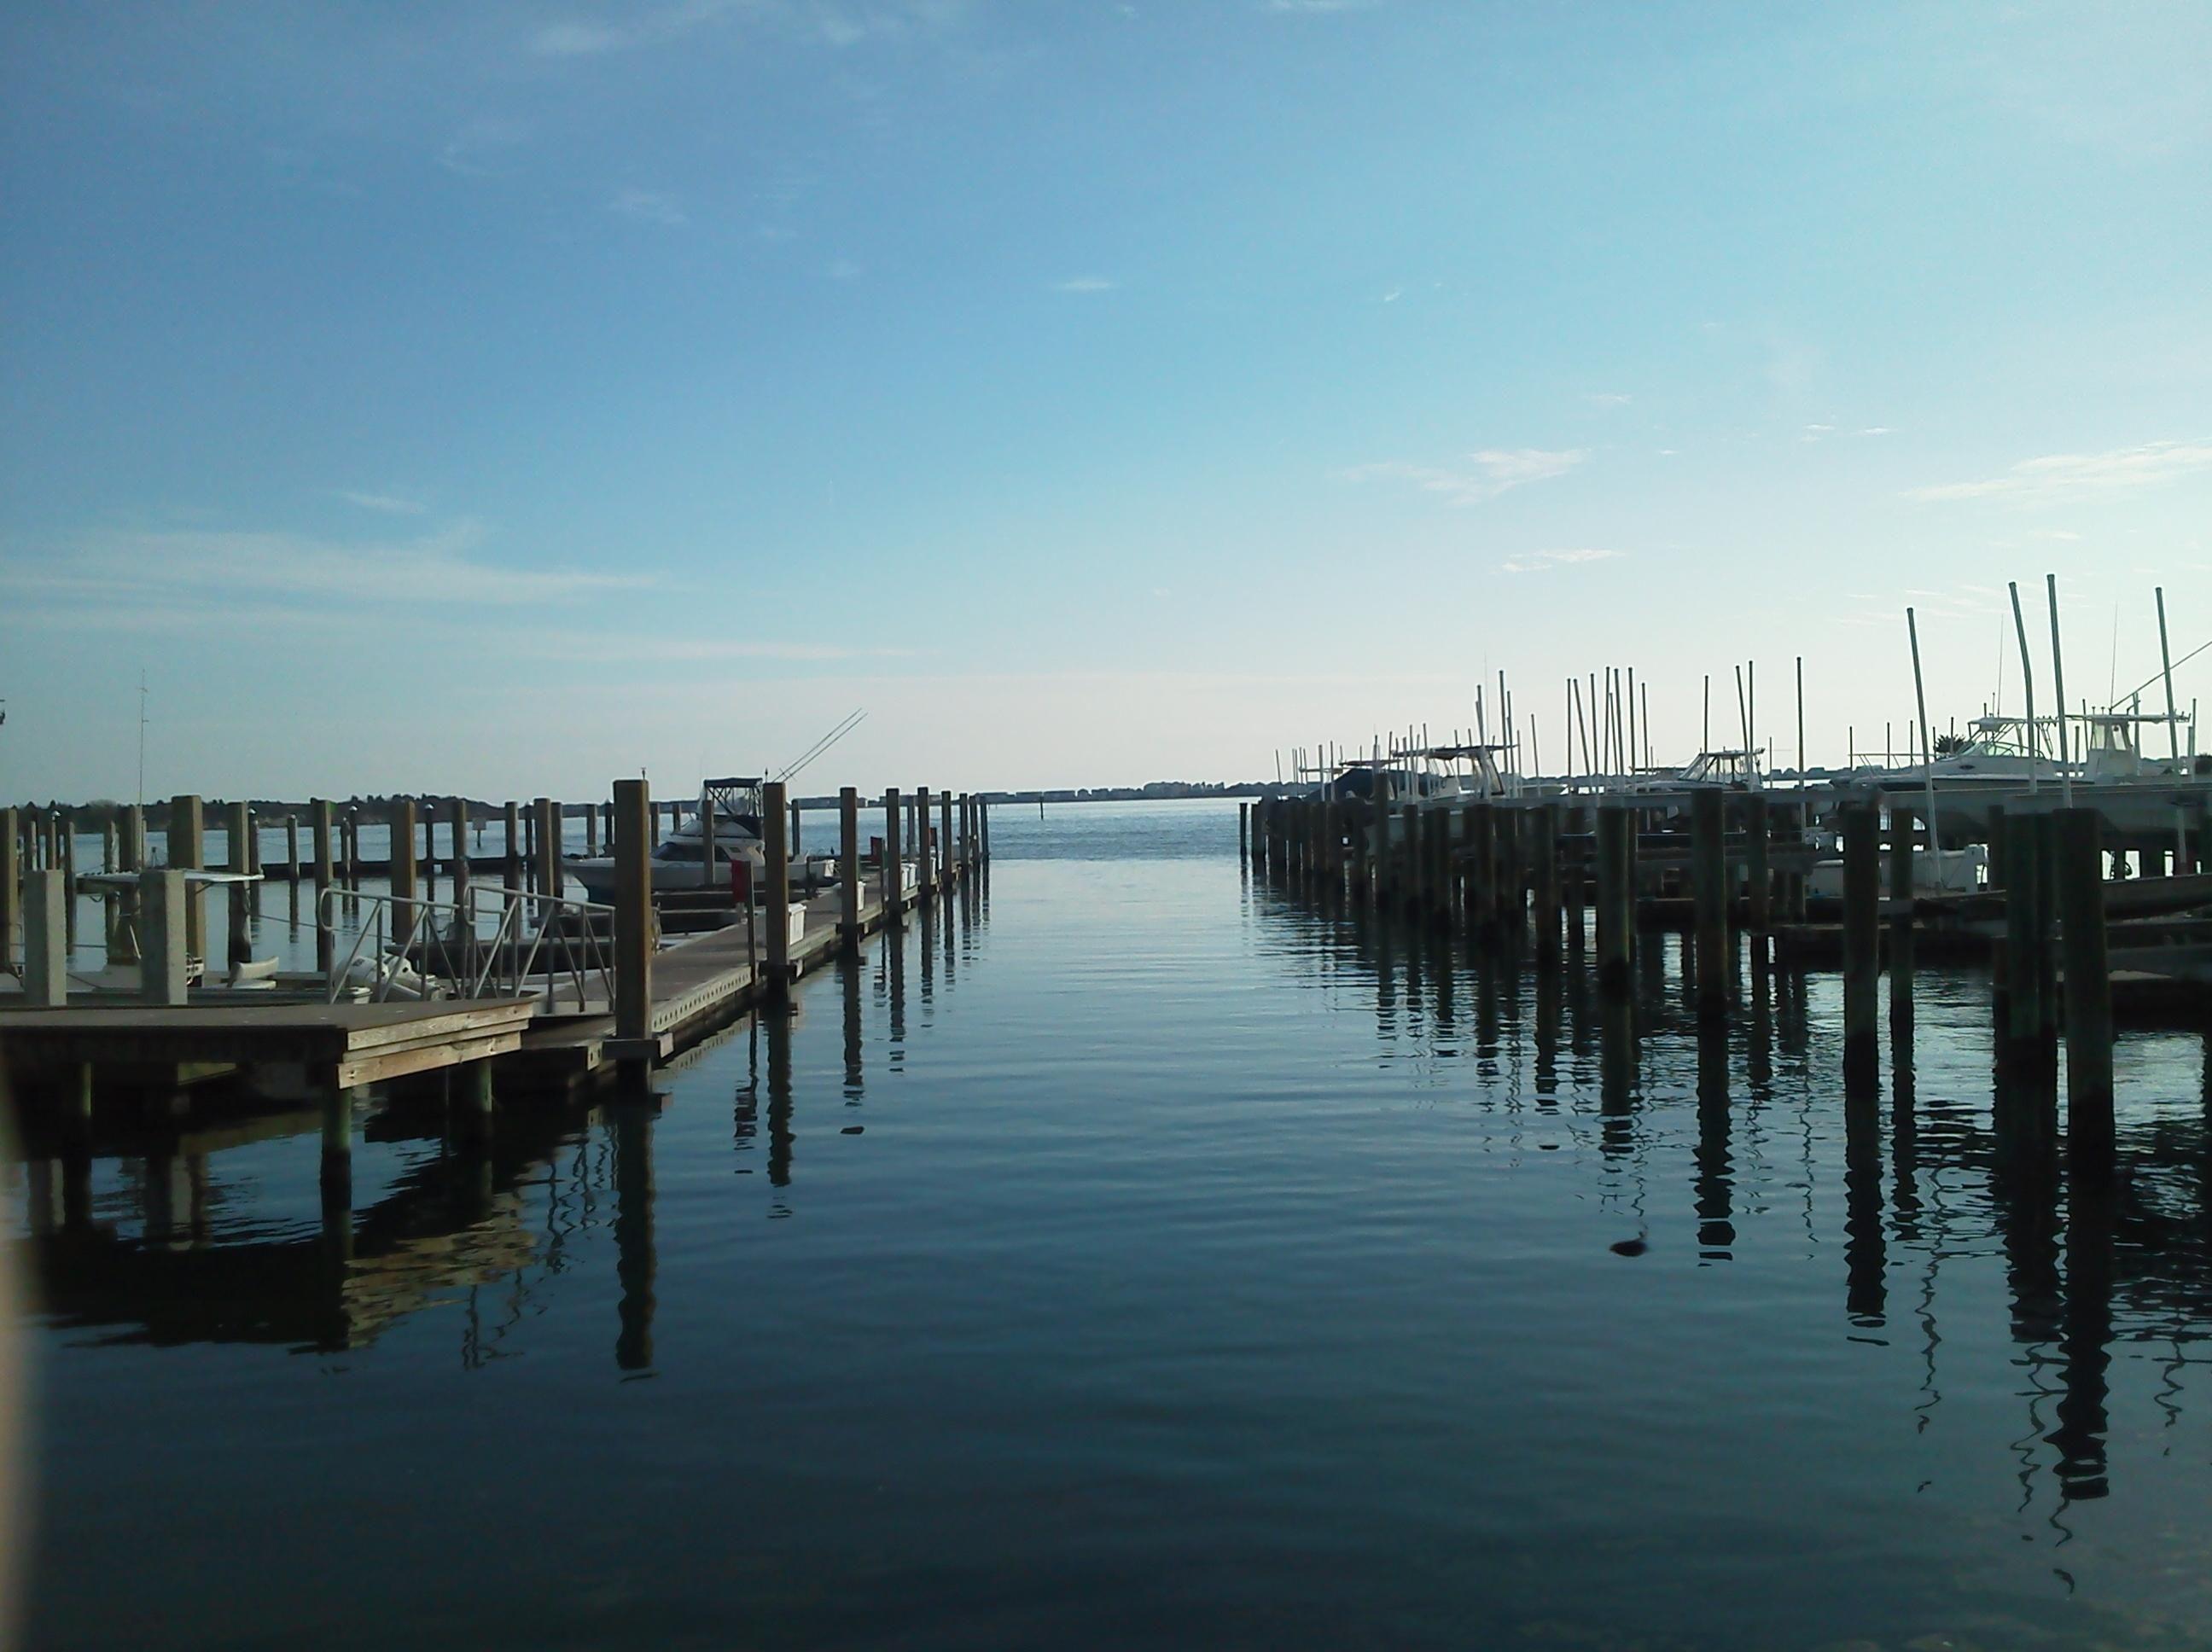 Morehead City Harbor in Morehead City, NC, United States